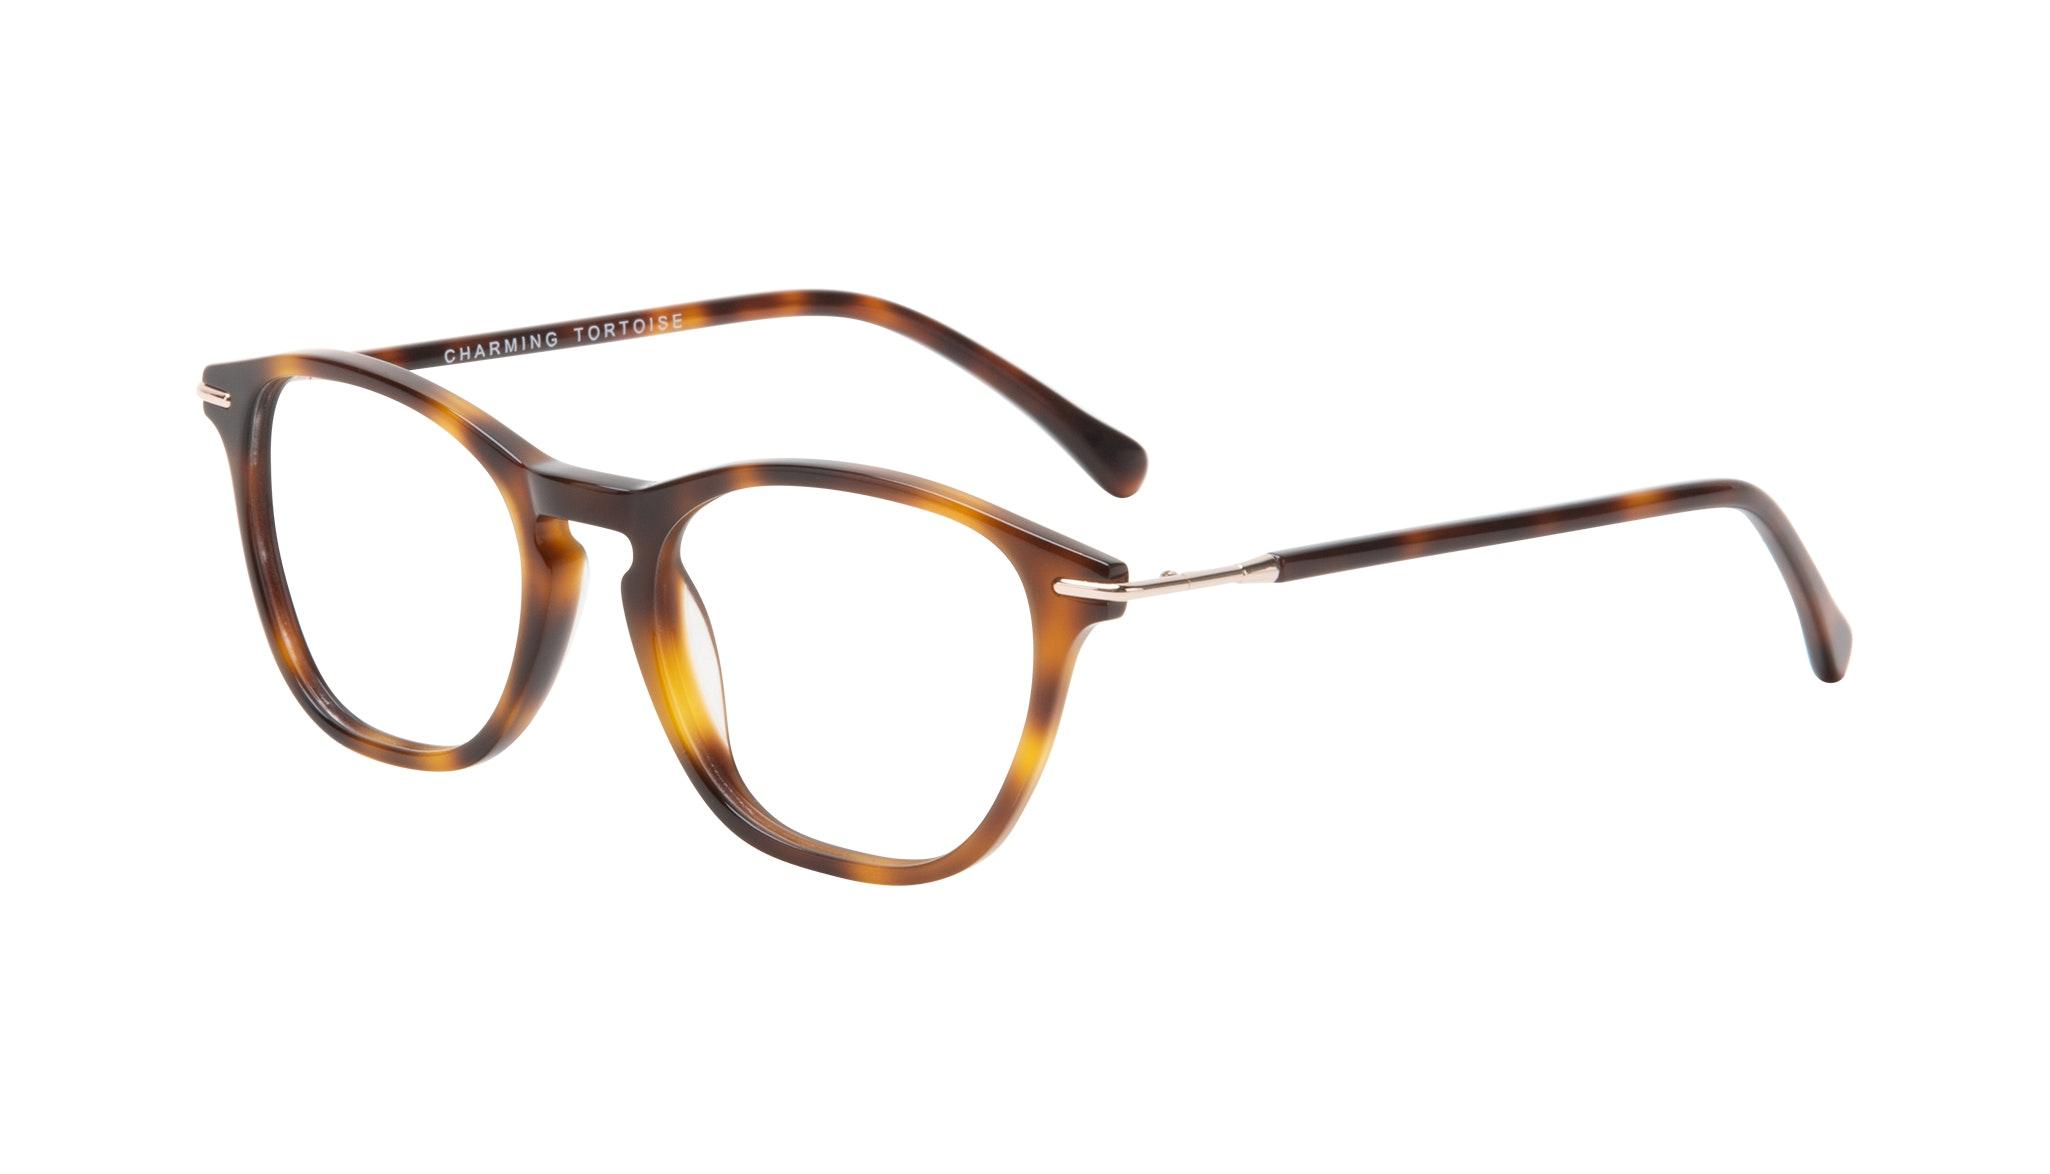 Affordable Fashion Glasses Square Eyeglasses Women Charming Tortoise Tilt